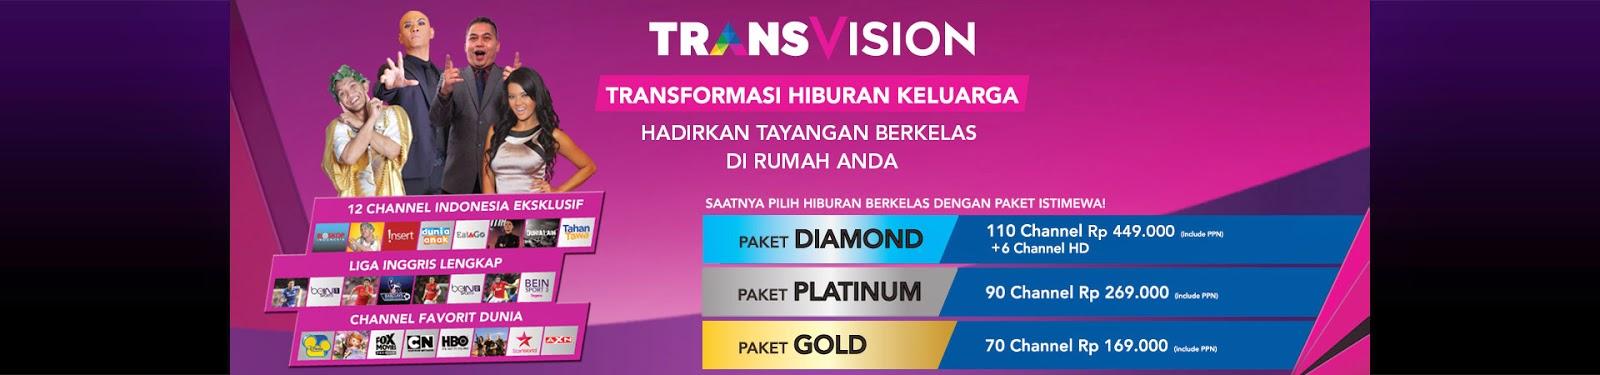 Paket dan Channel Transvision Terbaru